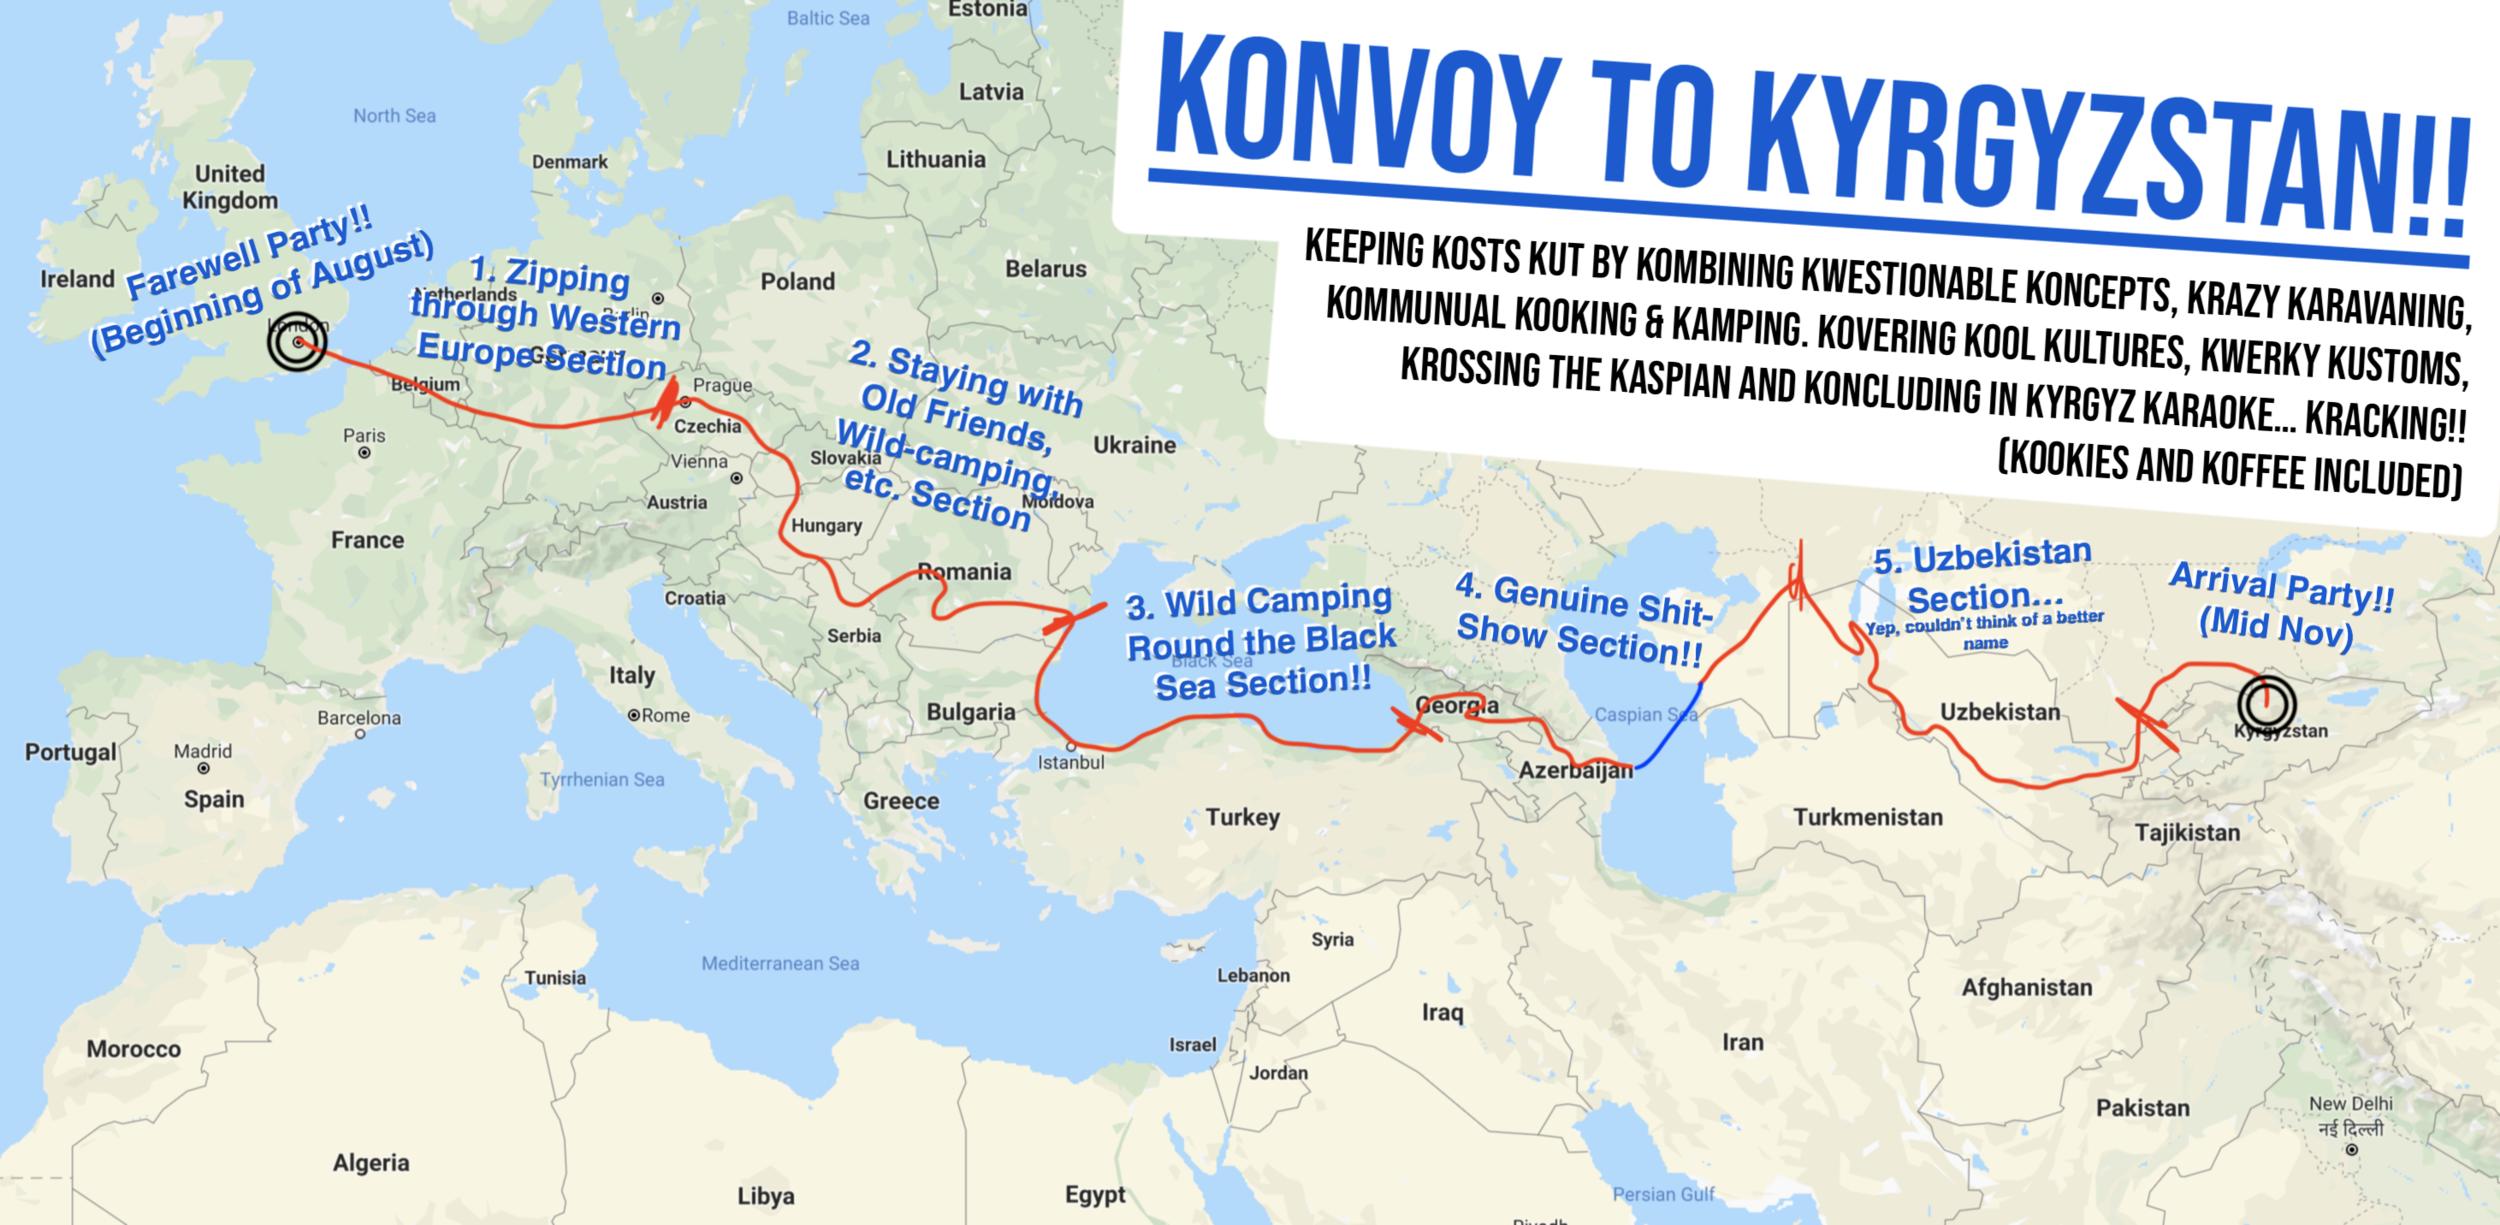 THE KONVOY TO KYRGYZSTAN - Early August to Mid-November, 2019Eurasia